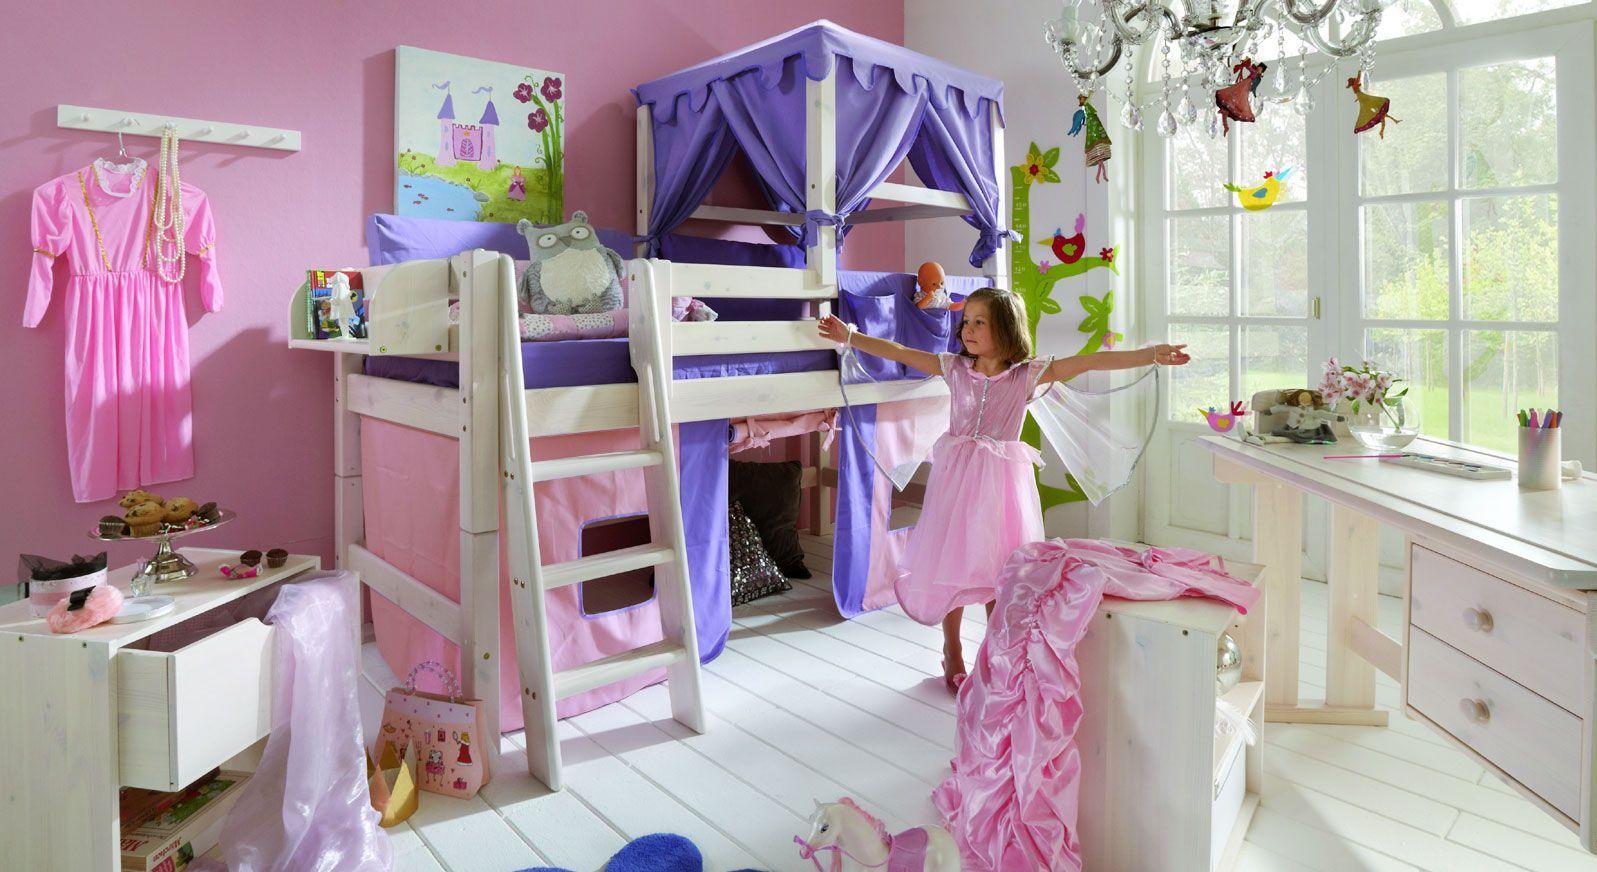 Full Size of Kinderzimmer Prinzessin Karolin Lillifee Gebraucht Prinzessinnen Komplett Bett Gestalten Playmobil Regale Regal Sofa Prinzessinen Weiß Kinderzimmer Kinderzimmer Prinzessin